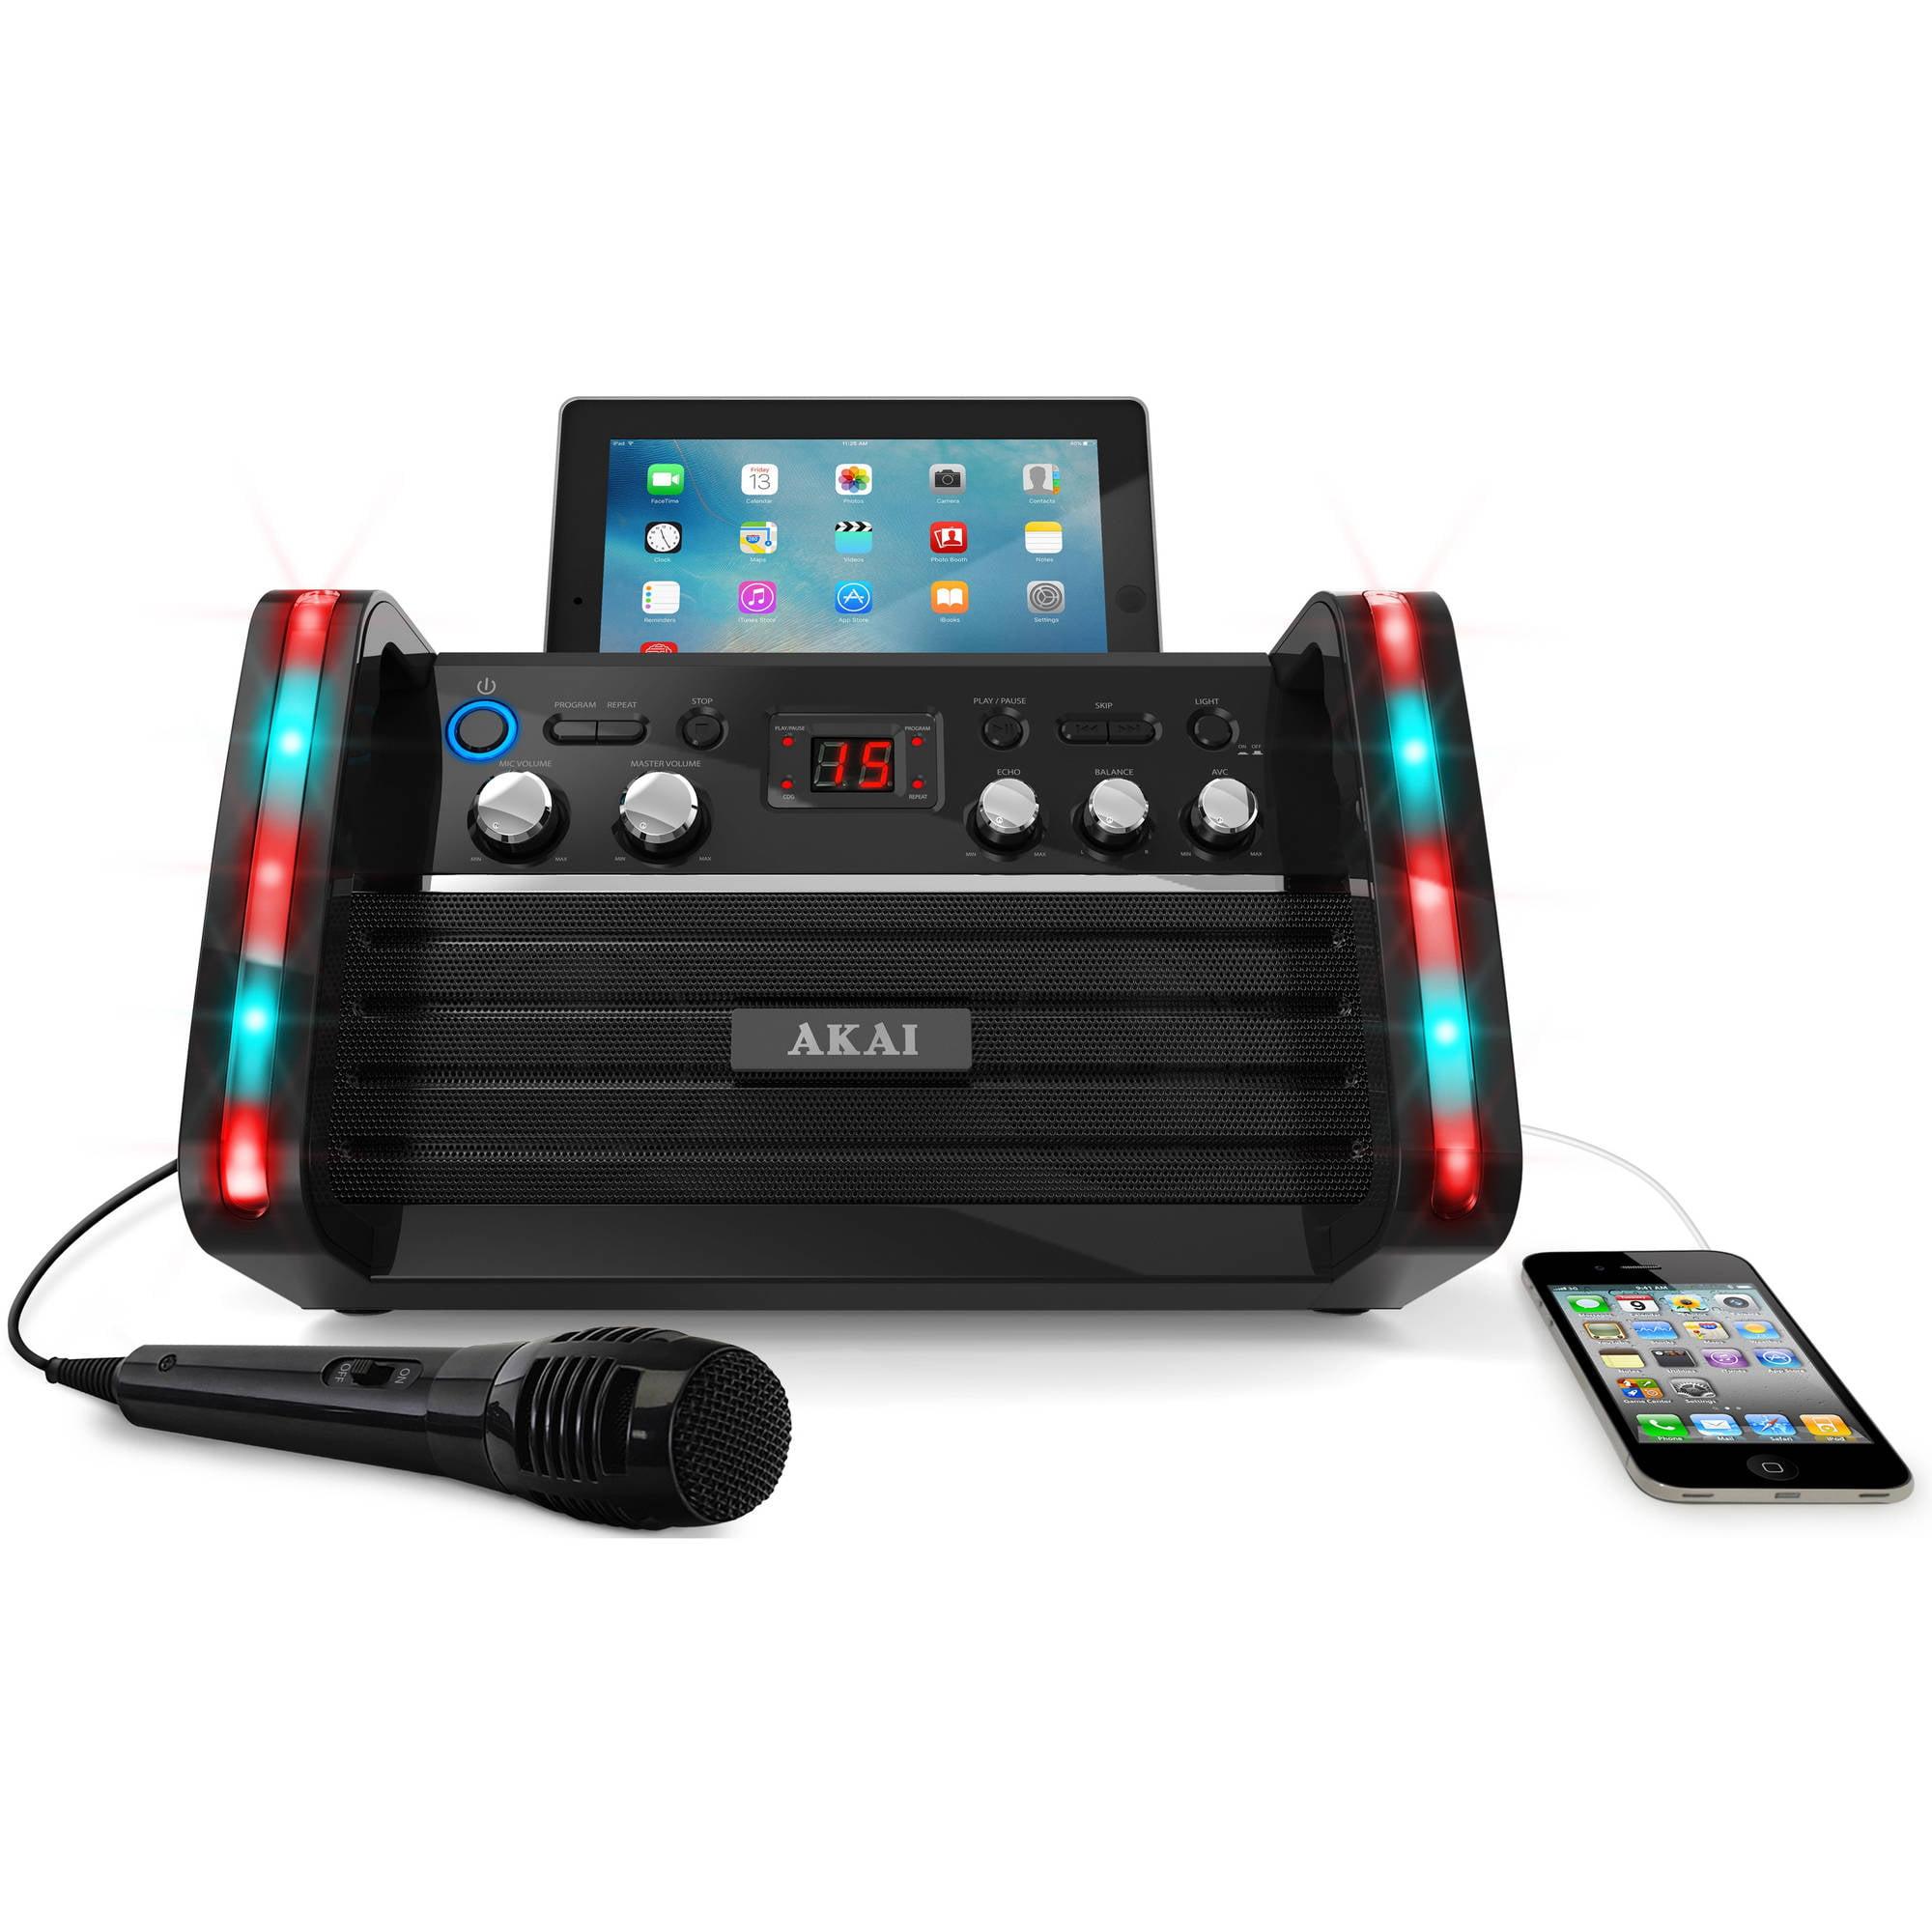 Akai KS-213 CD+G Karaoke Player with Apple iPad/iPod Cradle and Light Effect